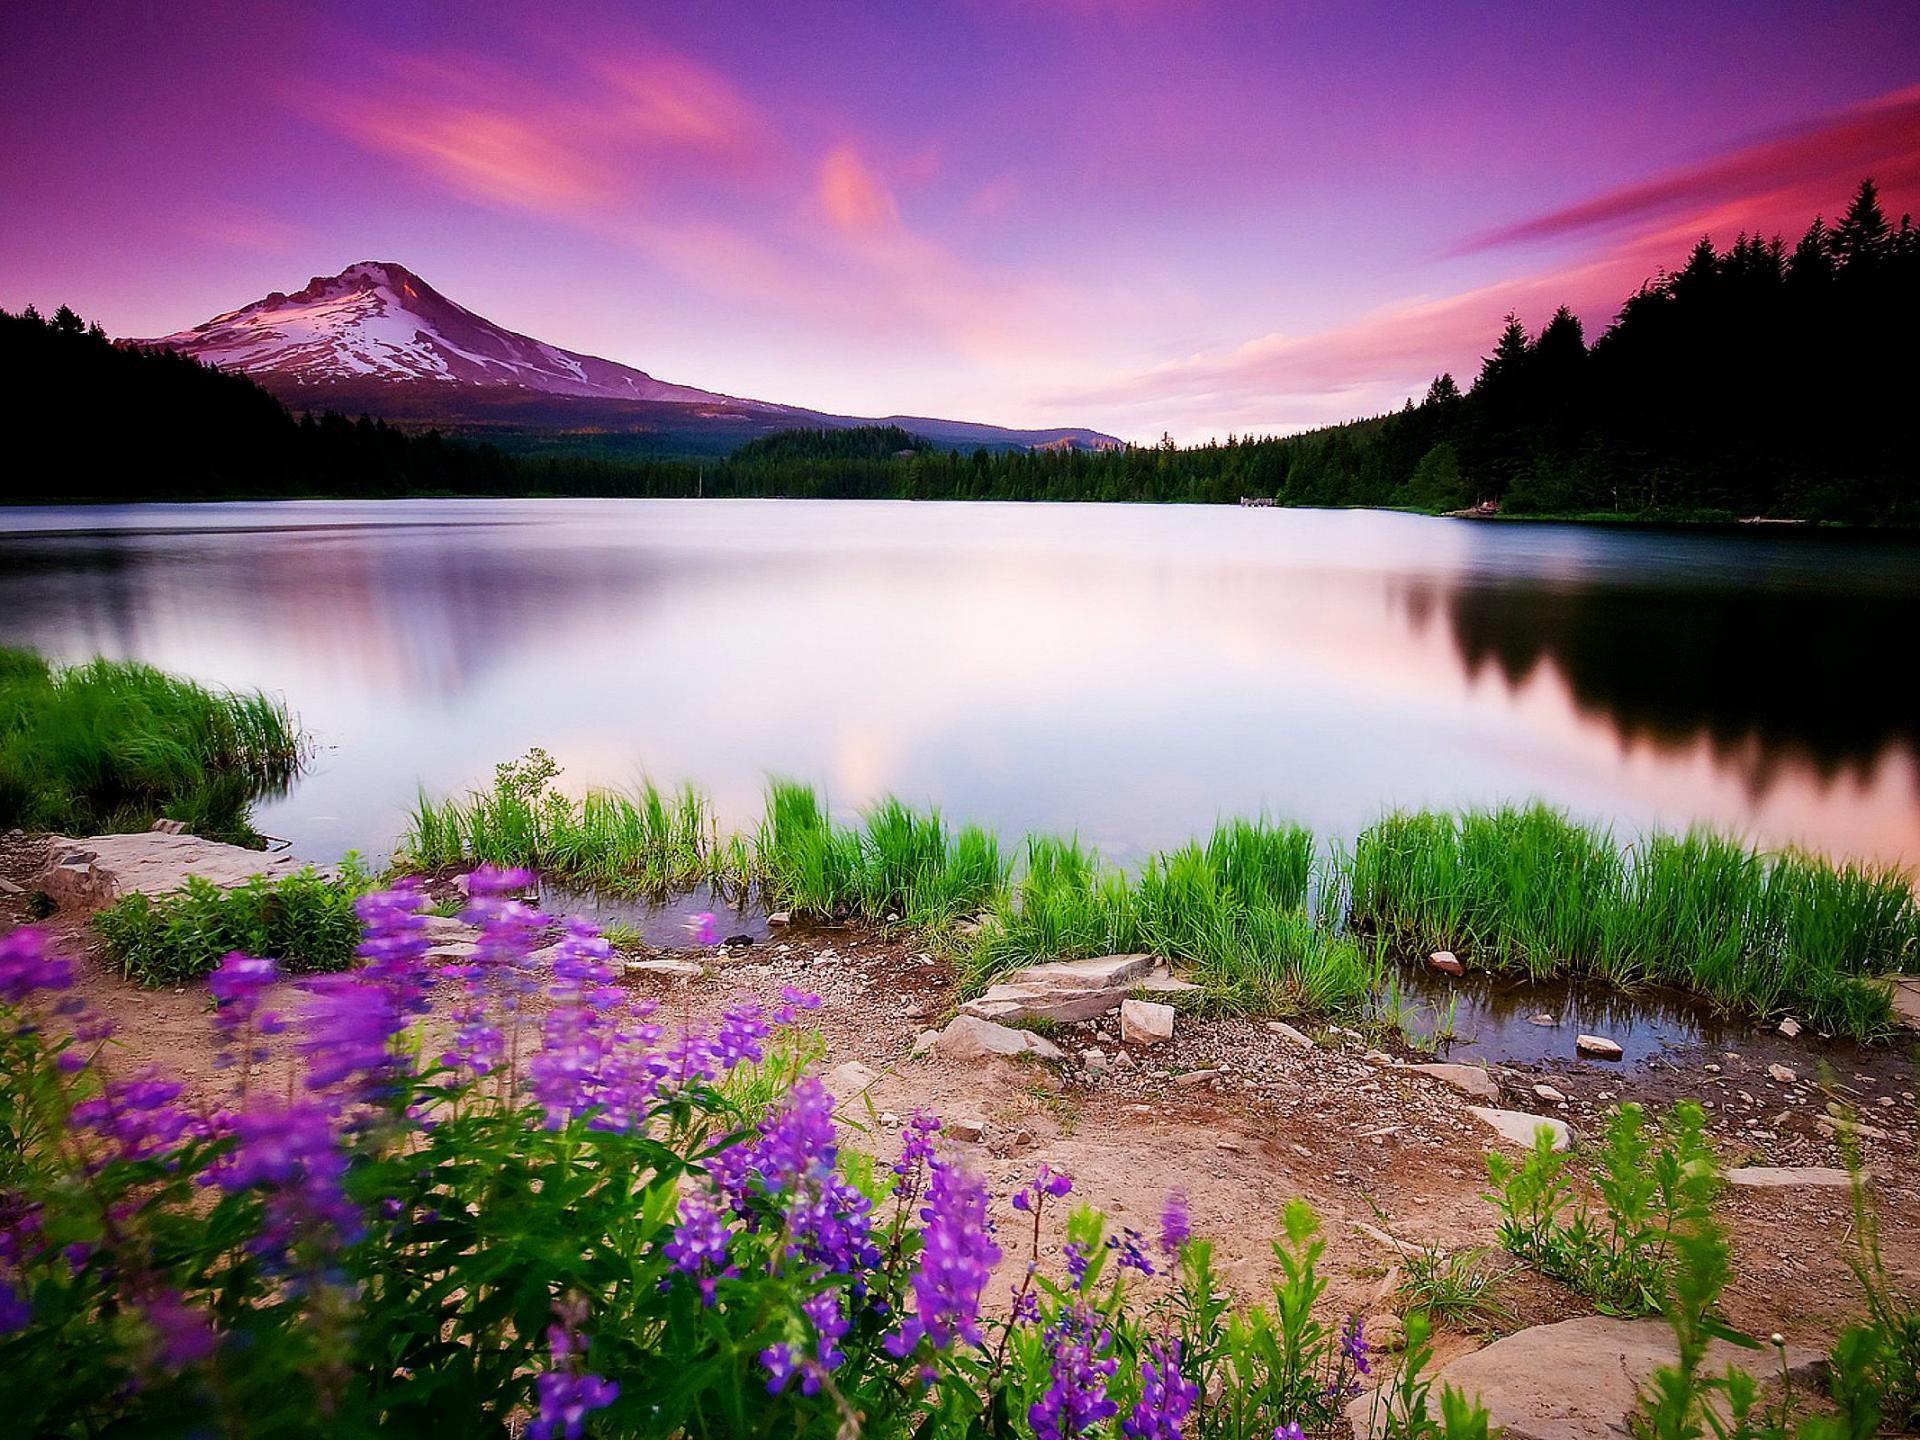 Beautiful view wallpaper hd | HD Wallpaper